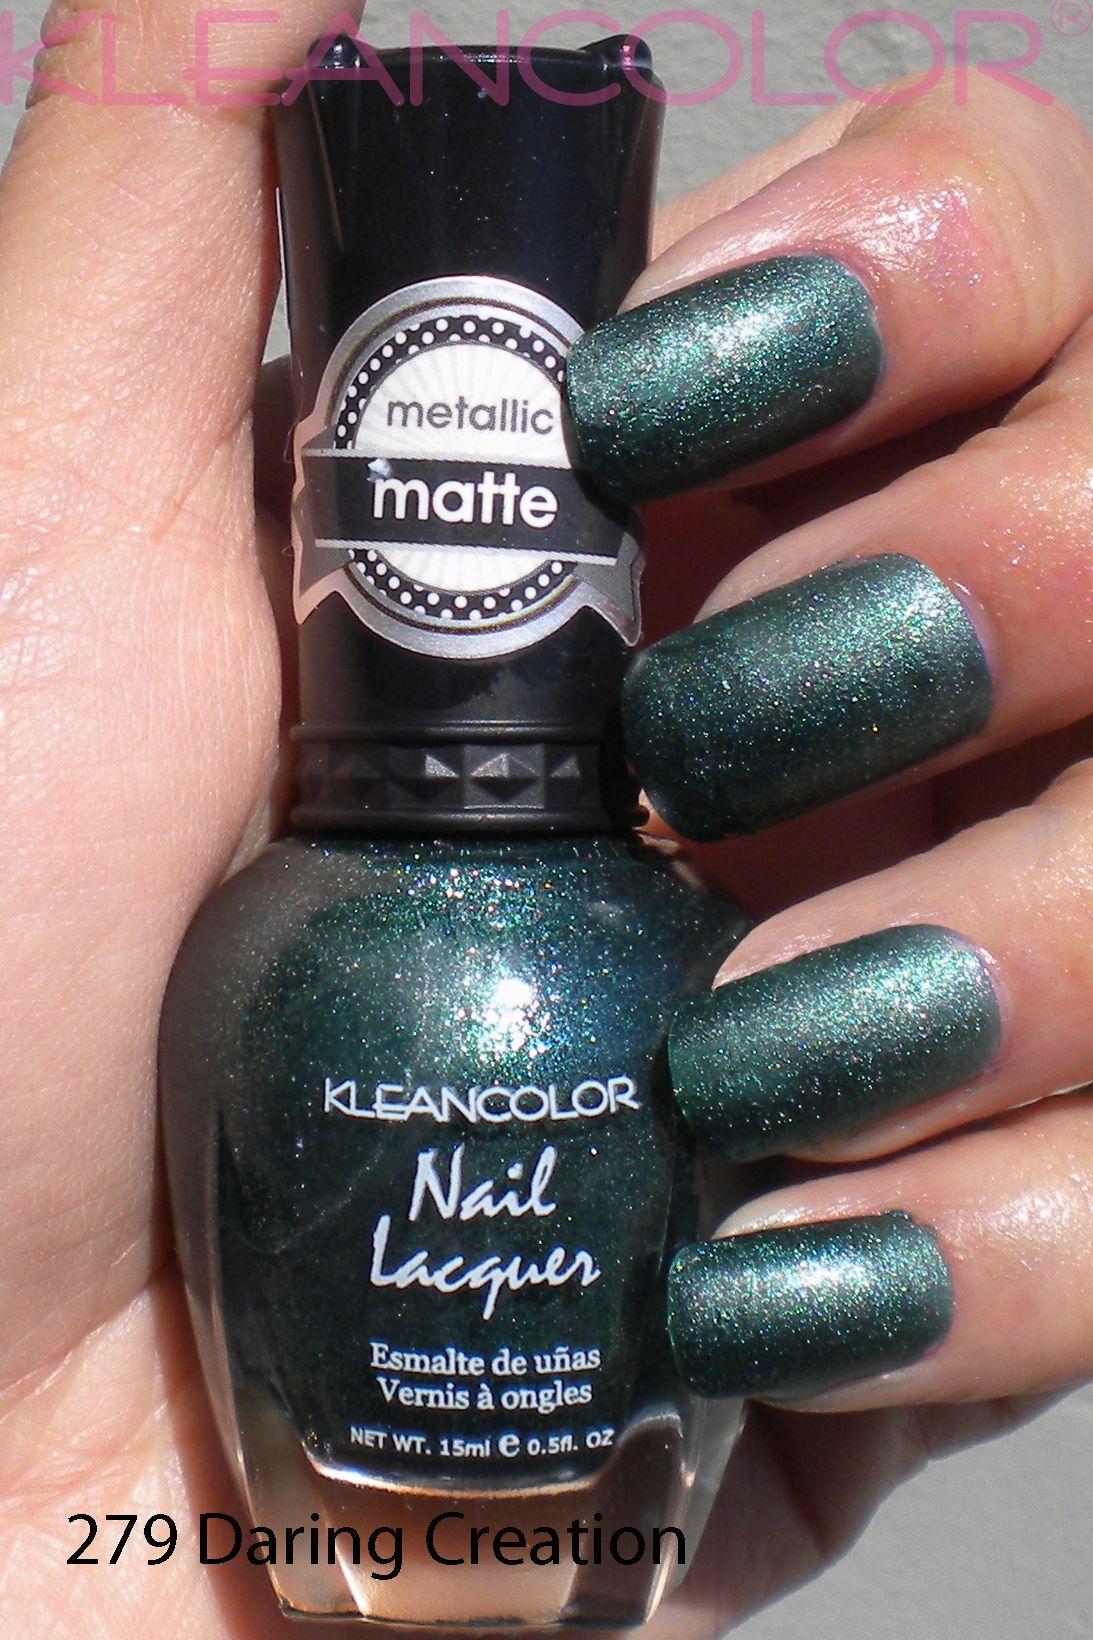 279 Daring Creation #mattepolish #matte #polish | Matte Nail Lacquer ...